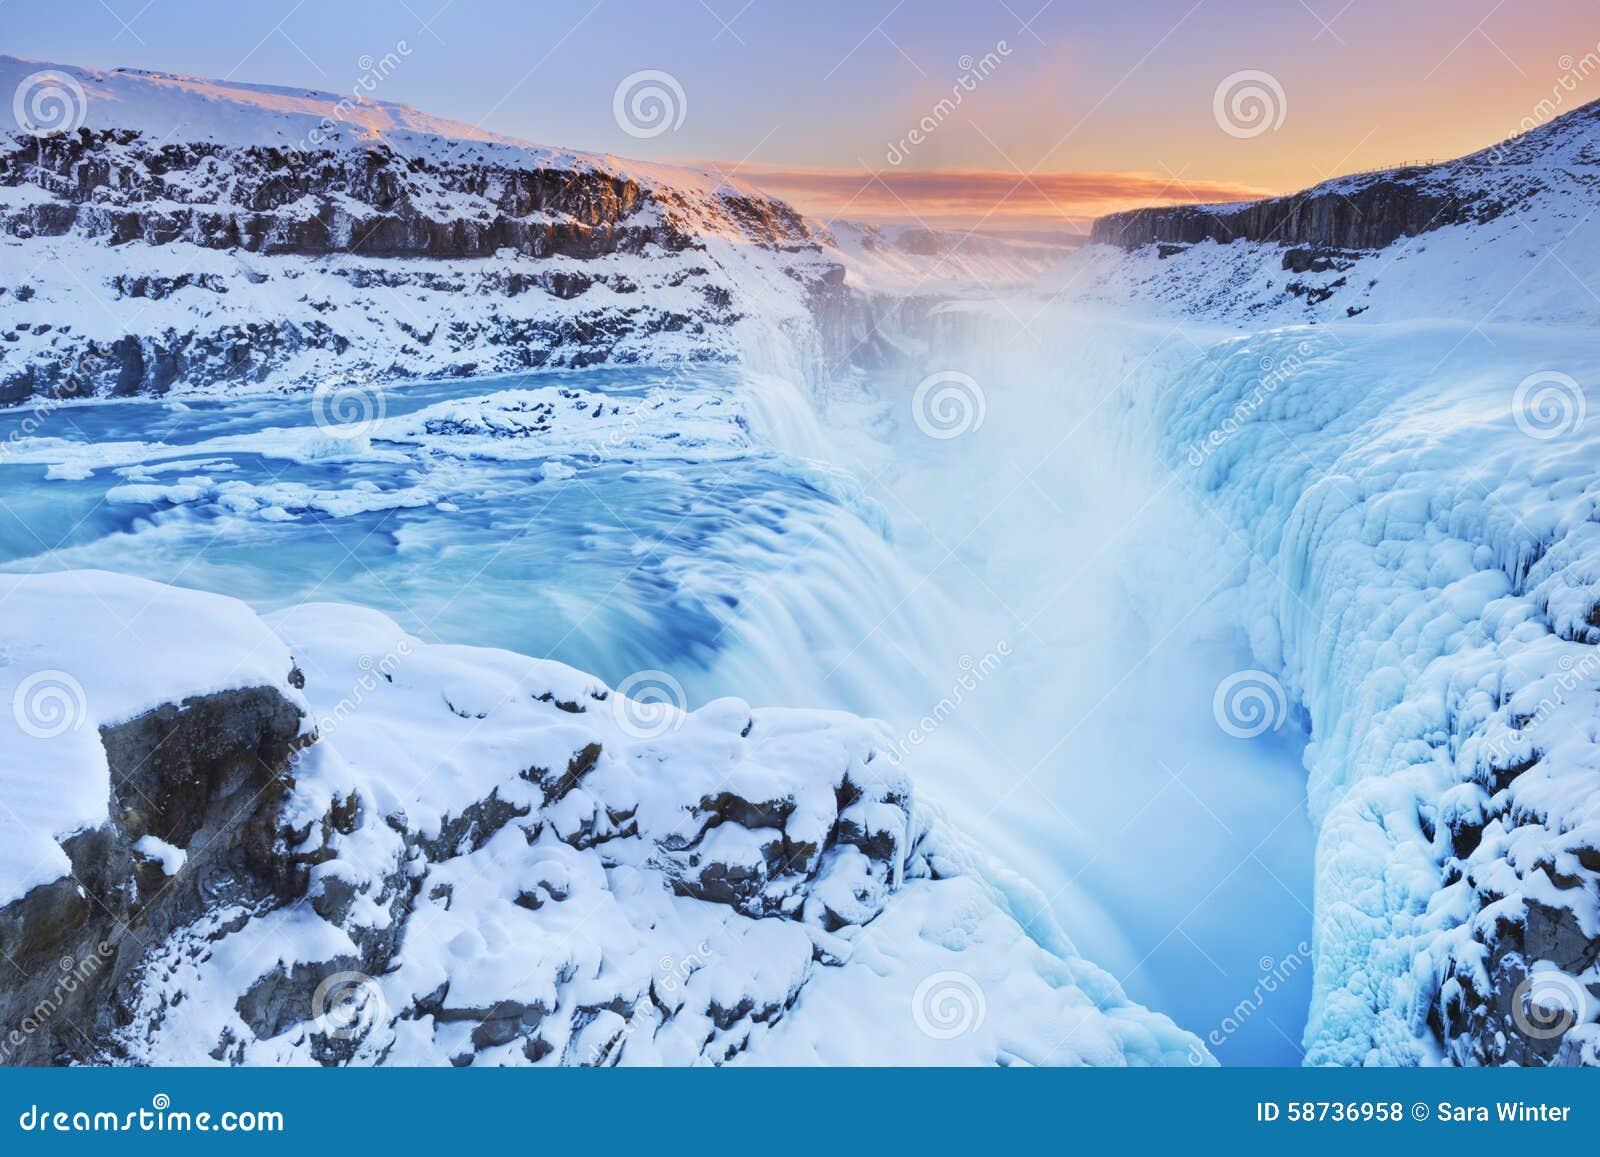 Frozen Gullfoss Falls in Iceland in winter at sunset